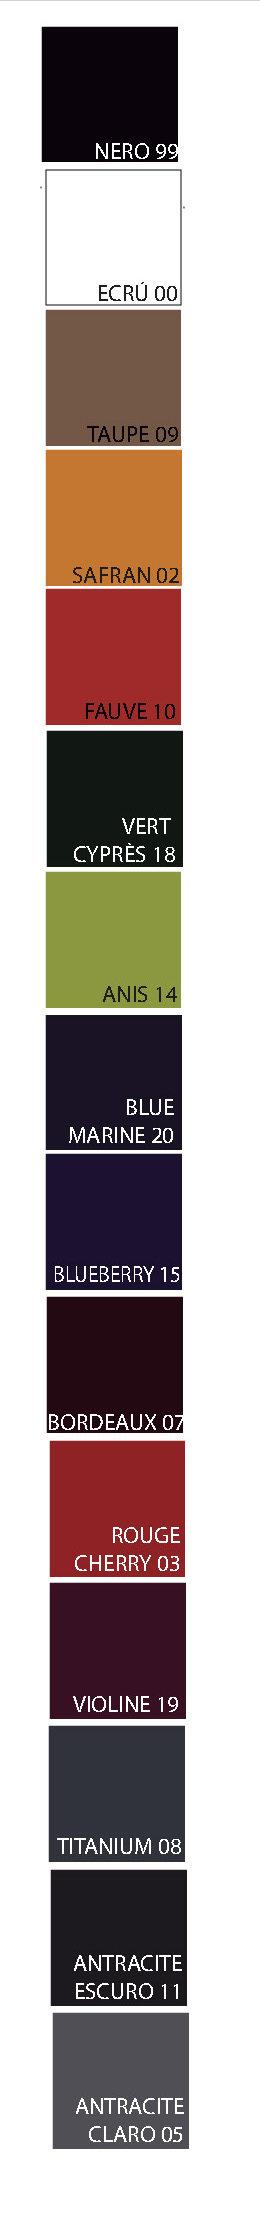 Maloka: Inverted Rose Bud Wool Midi Dress (1 Left in Blue Marine!)